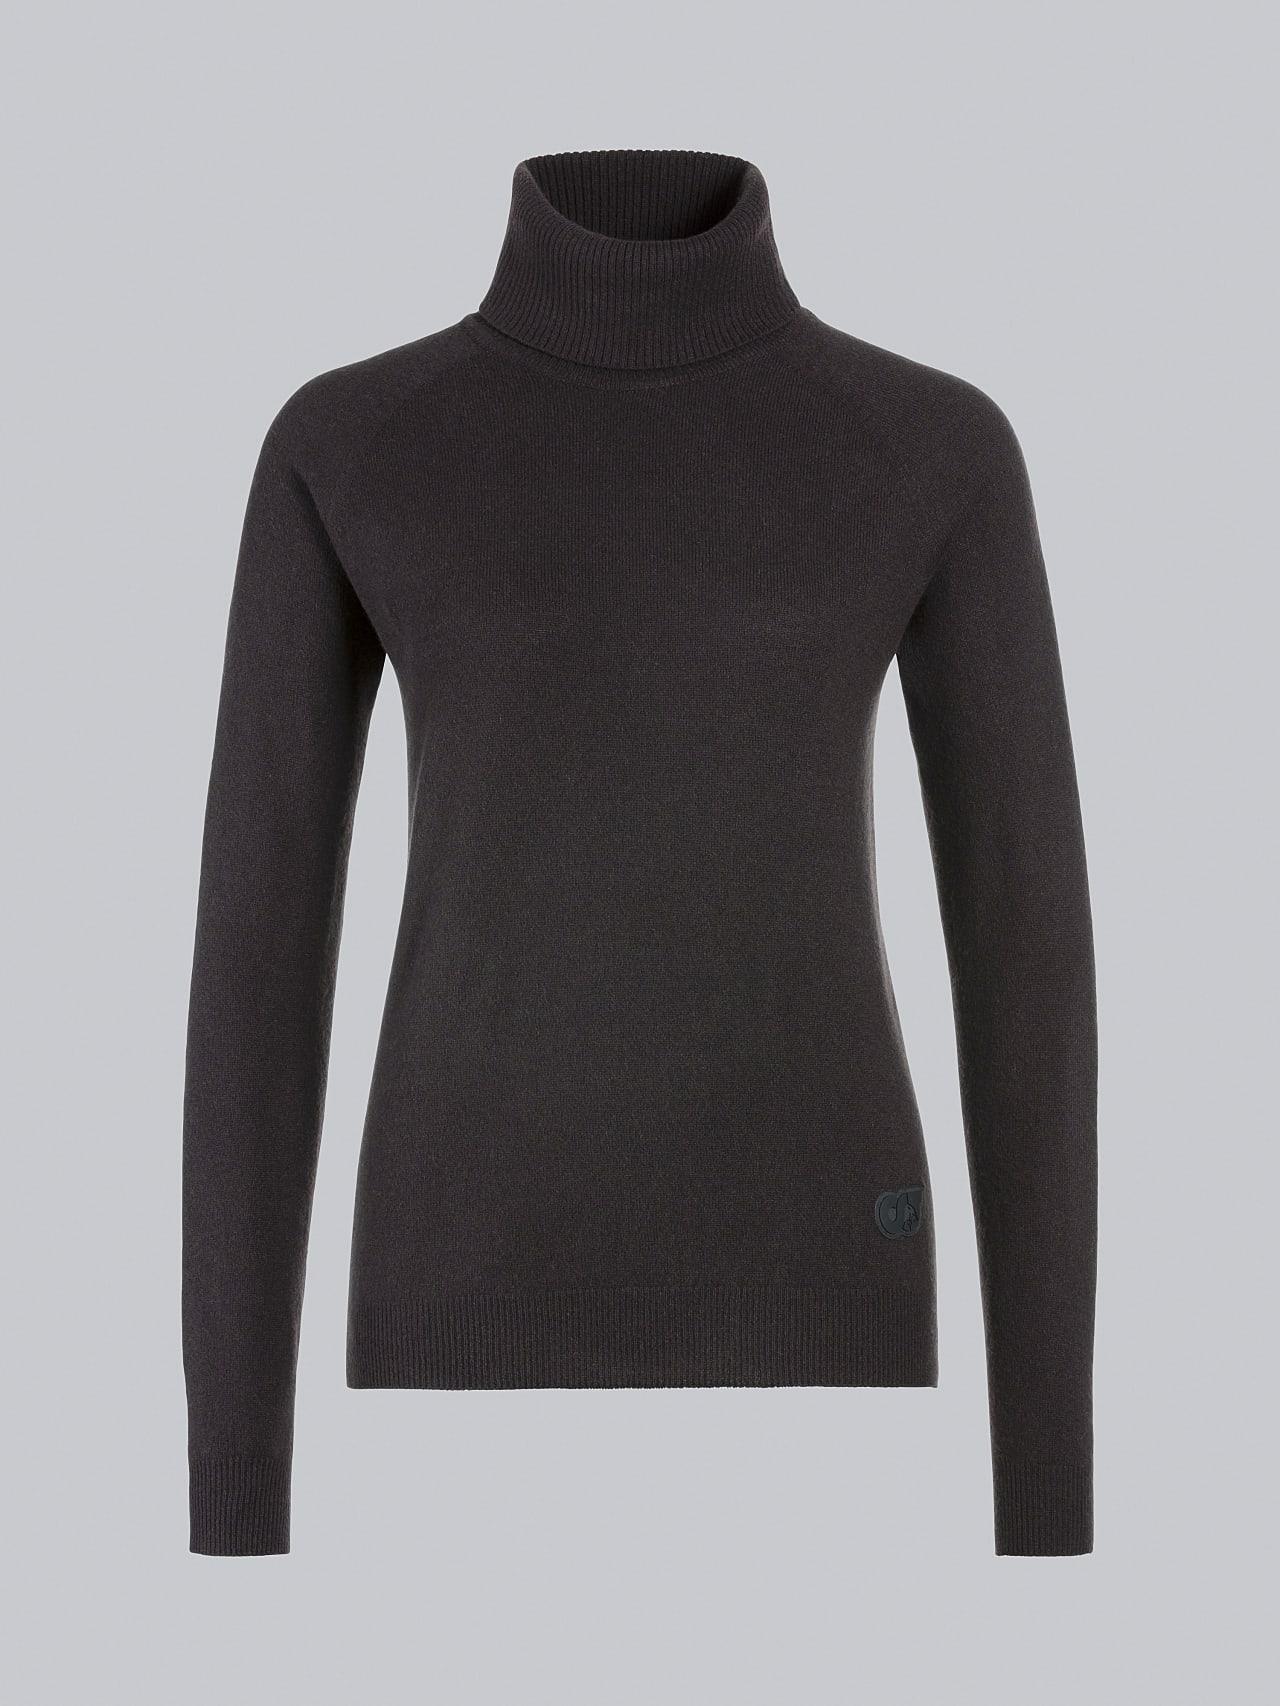 FLAMY V1.Y5.02 Seamless 3D Knit Merino-Cashmere Turtle Neck Burgundy Back Alpha Tauri